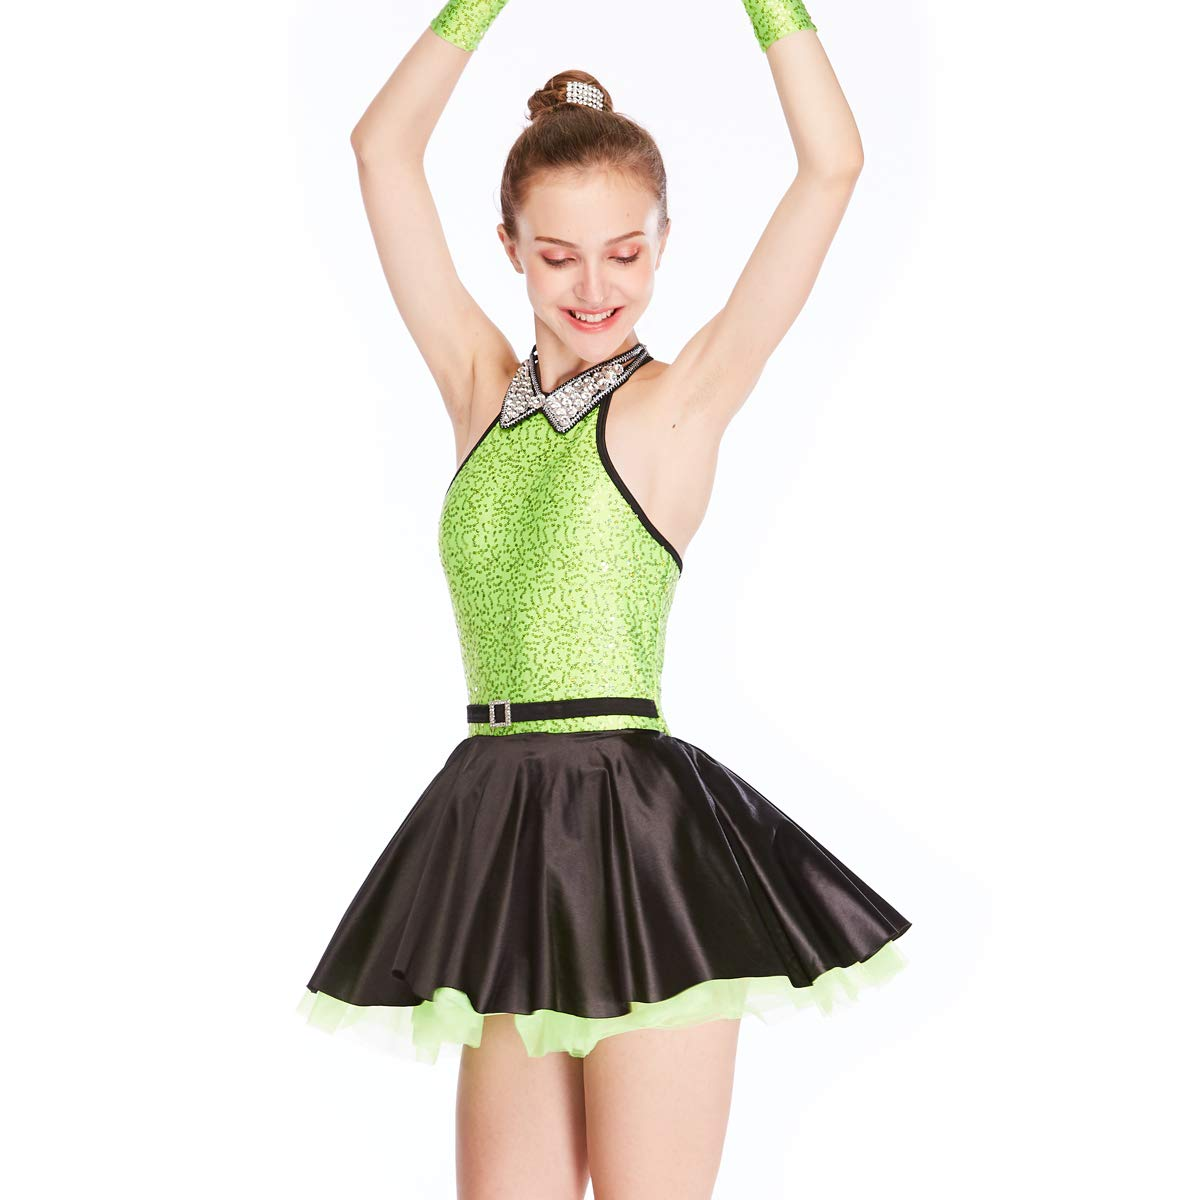 MiDee Jazz Dress Dance Costume High Neck with Sparkle Austria Rhinestones Collar (PA, AppleGreen) by MiDee